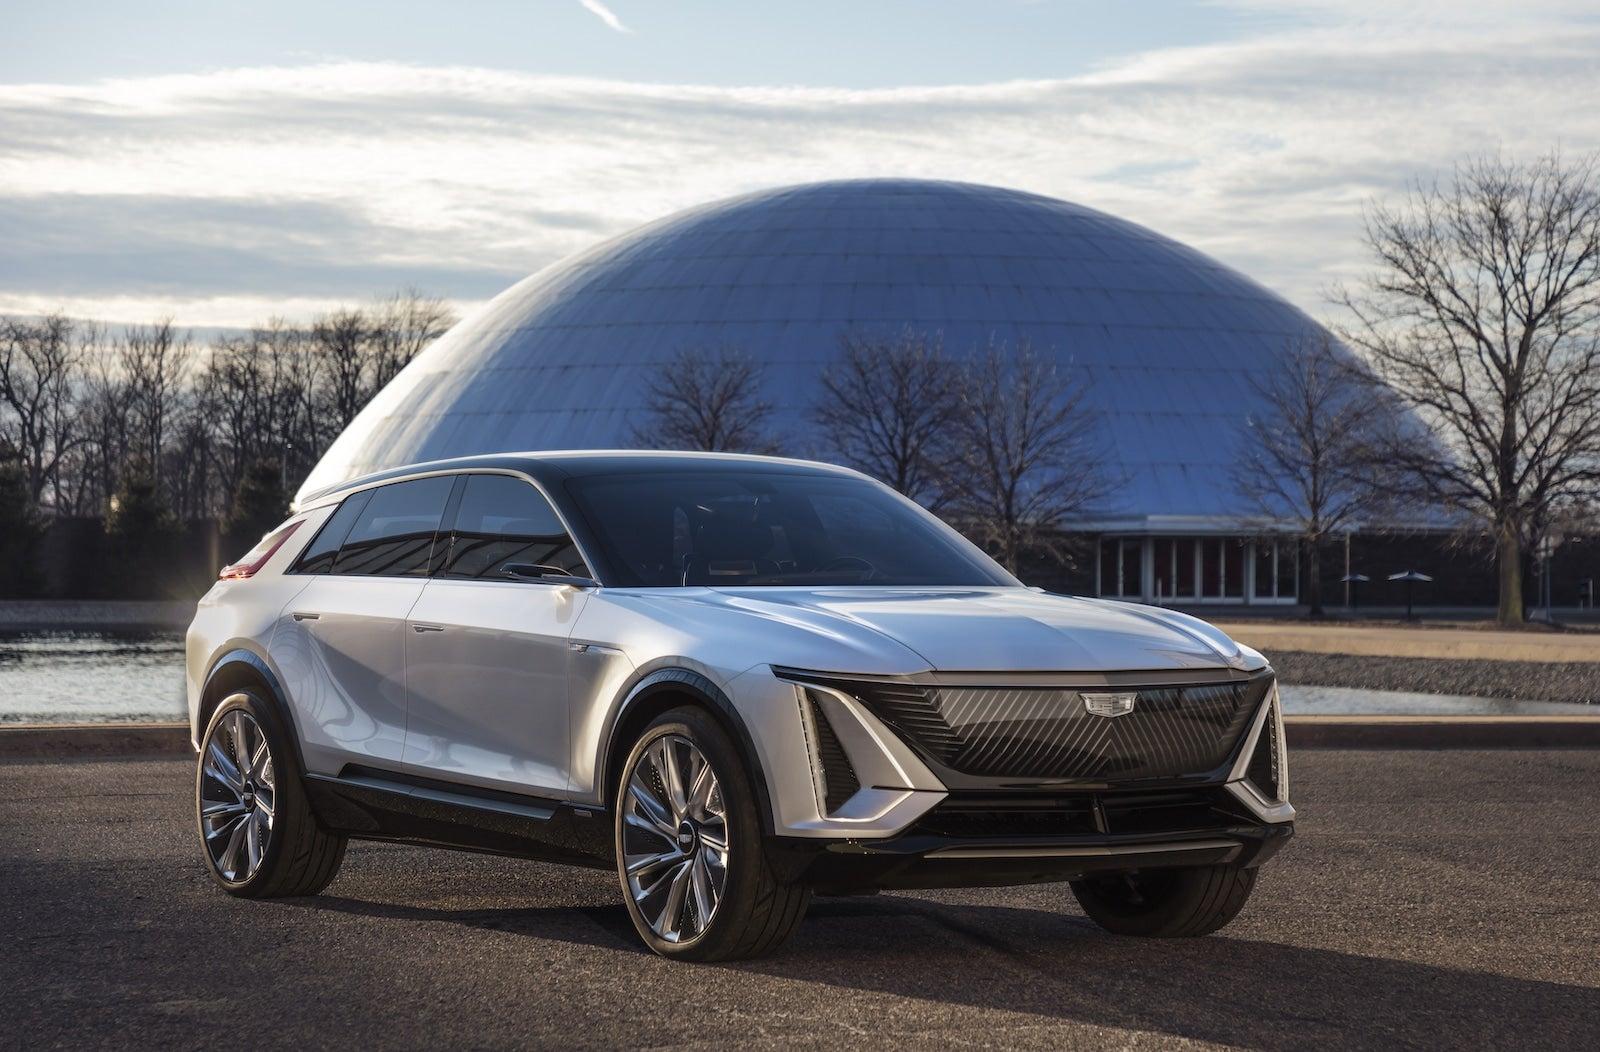 2020 - [Cadillac] Lyriq - Page 2 Cadillac-Lyriq-at-Design-Dome